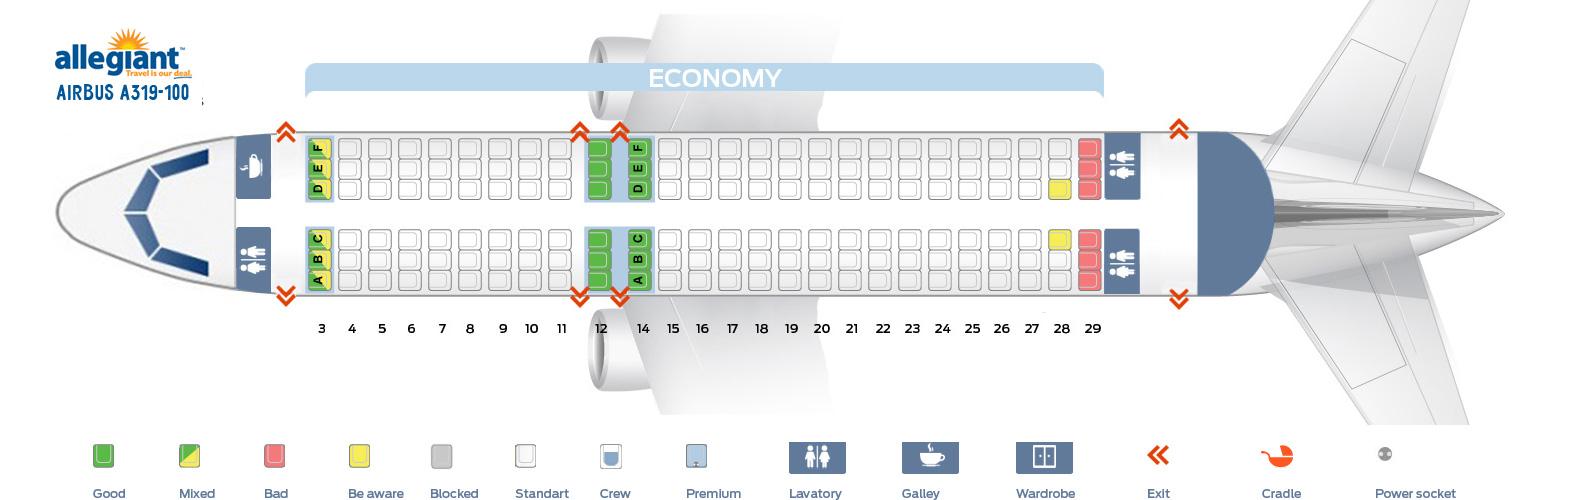 seat map airbus a allegiant air best seats in the plane - seat map airbus a allegiant air